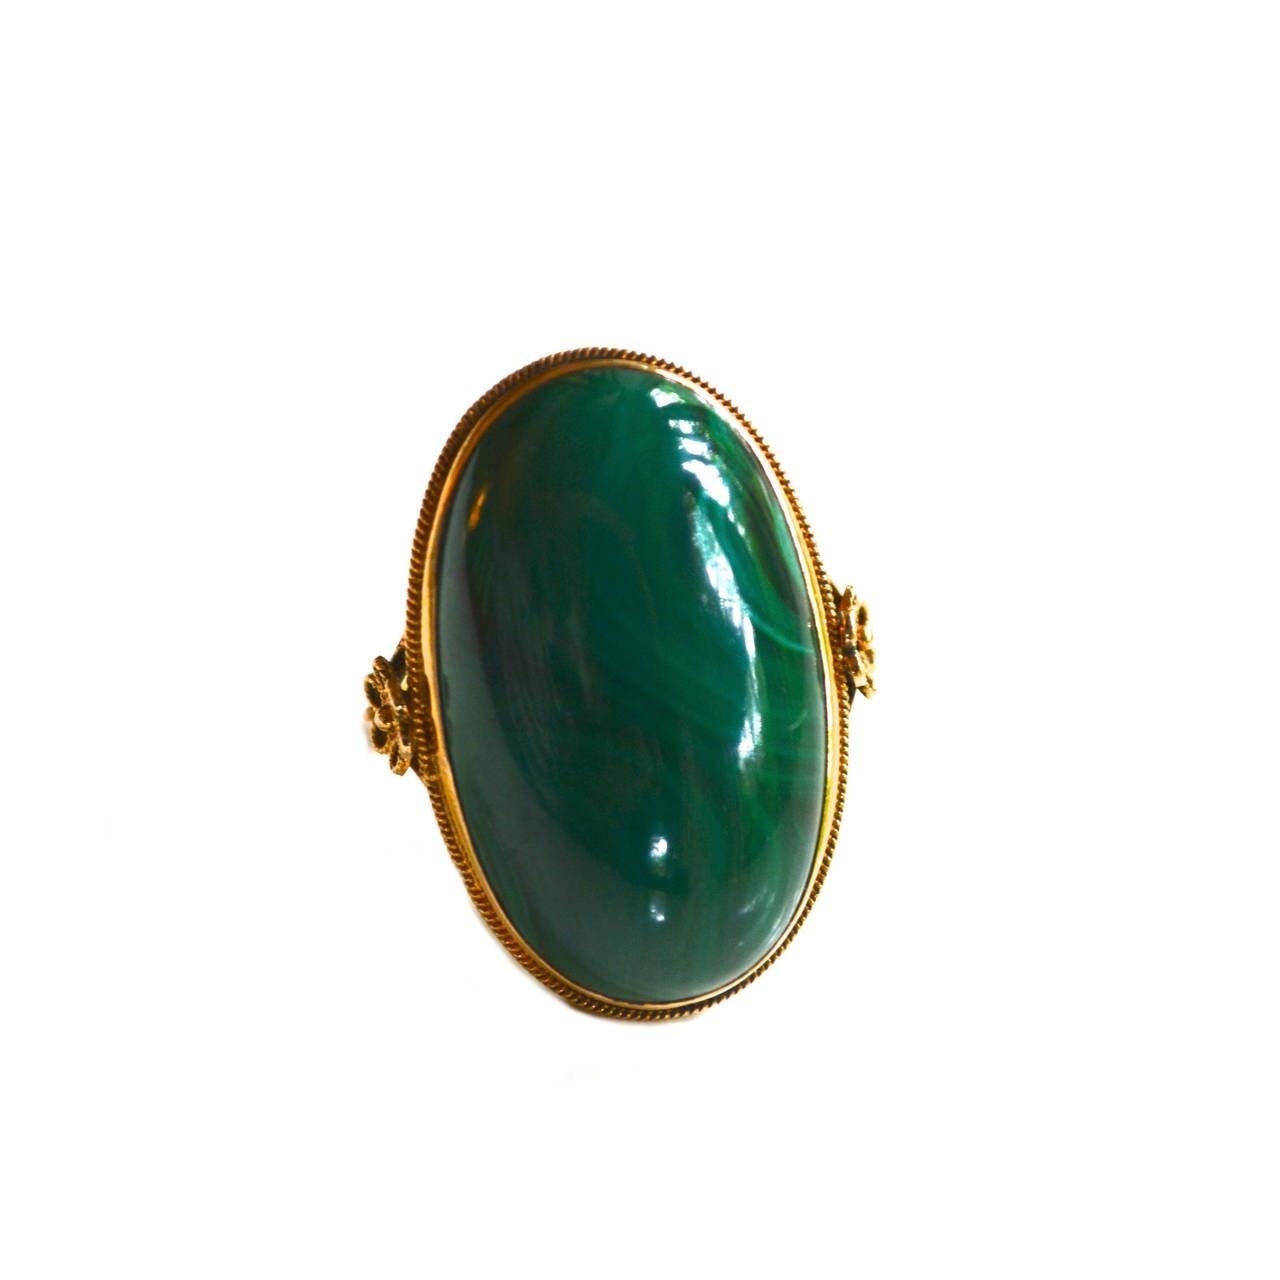 Edwardian 18K Gold Malachite Ring 1